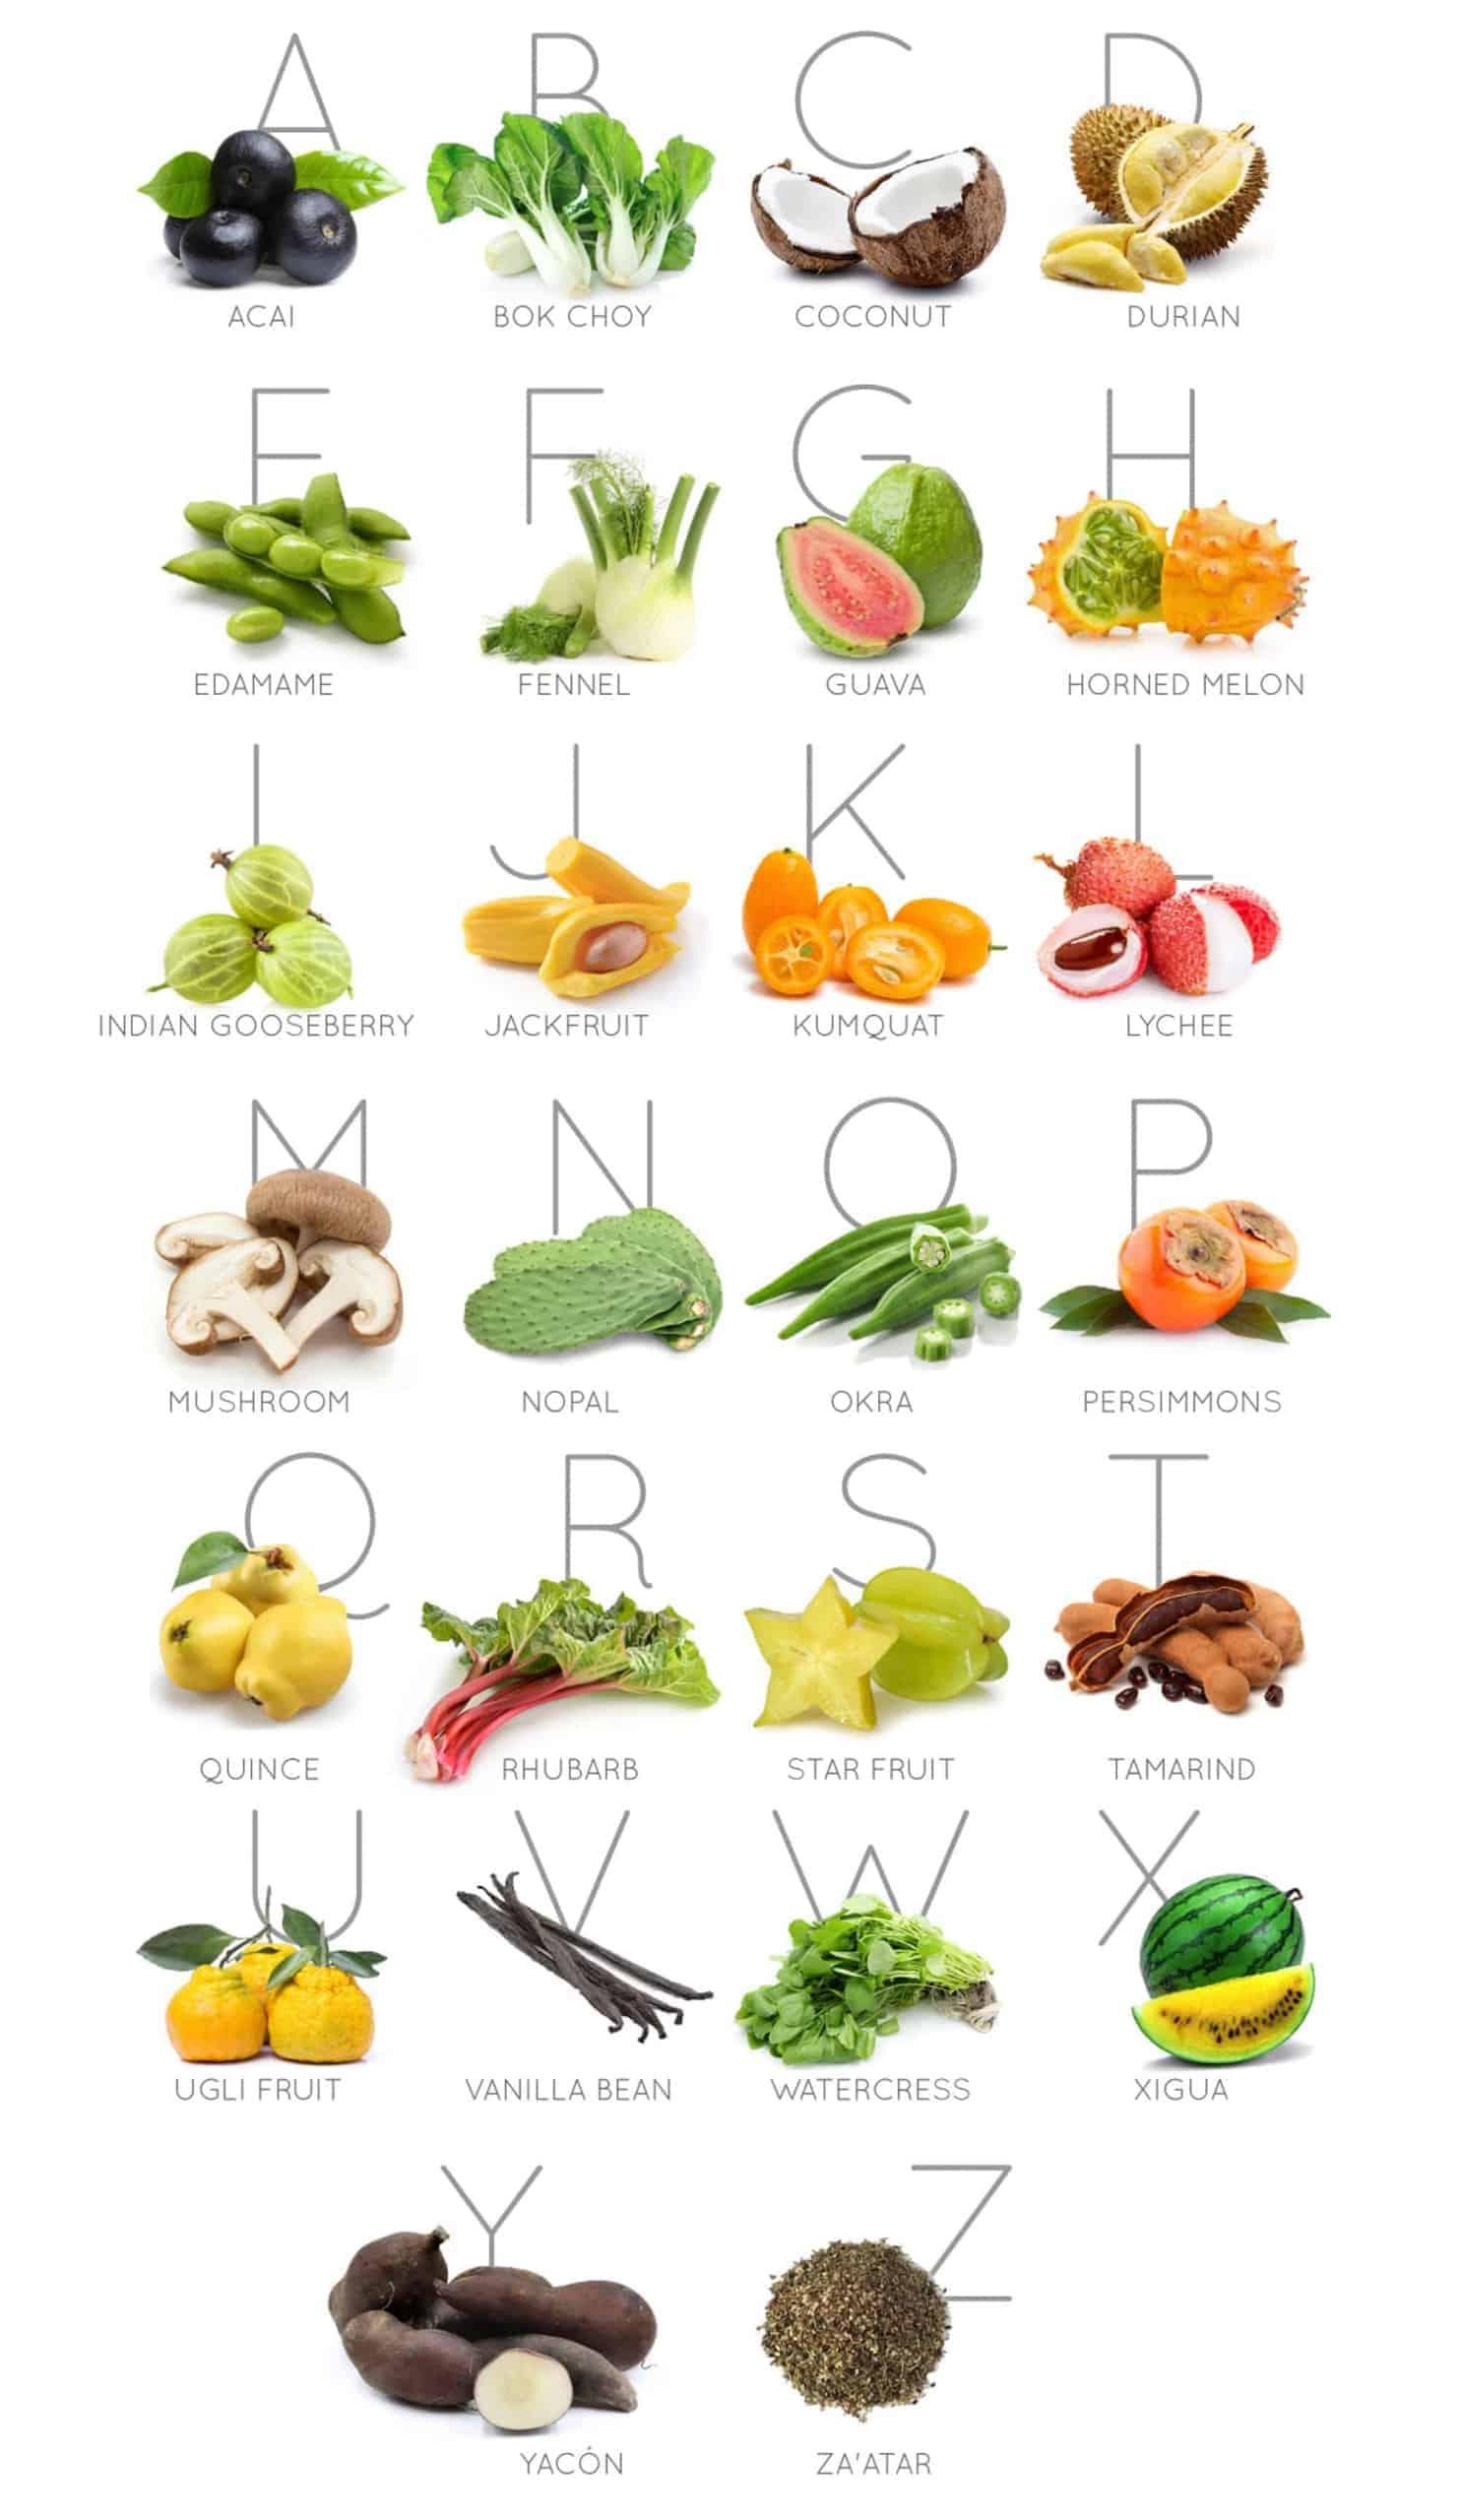 Food in alphabetical order